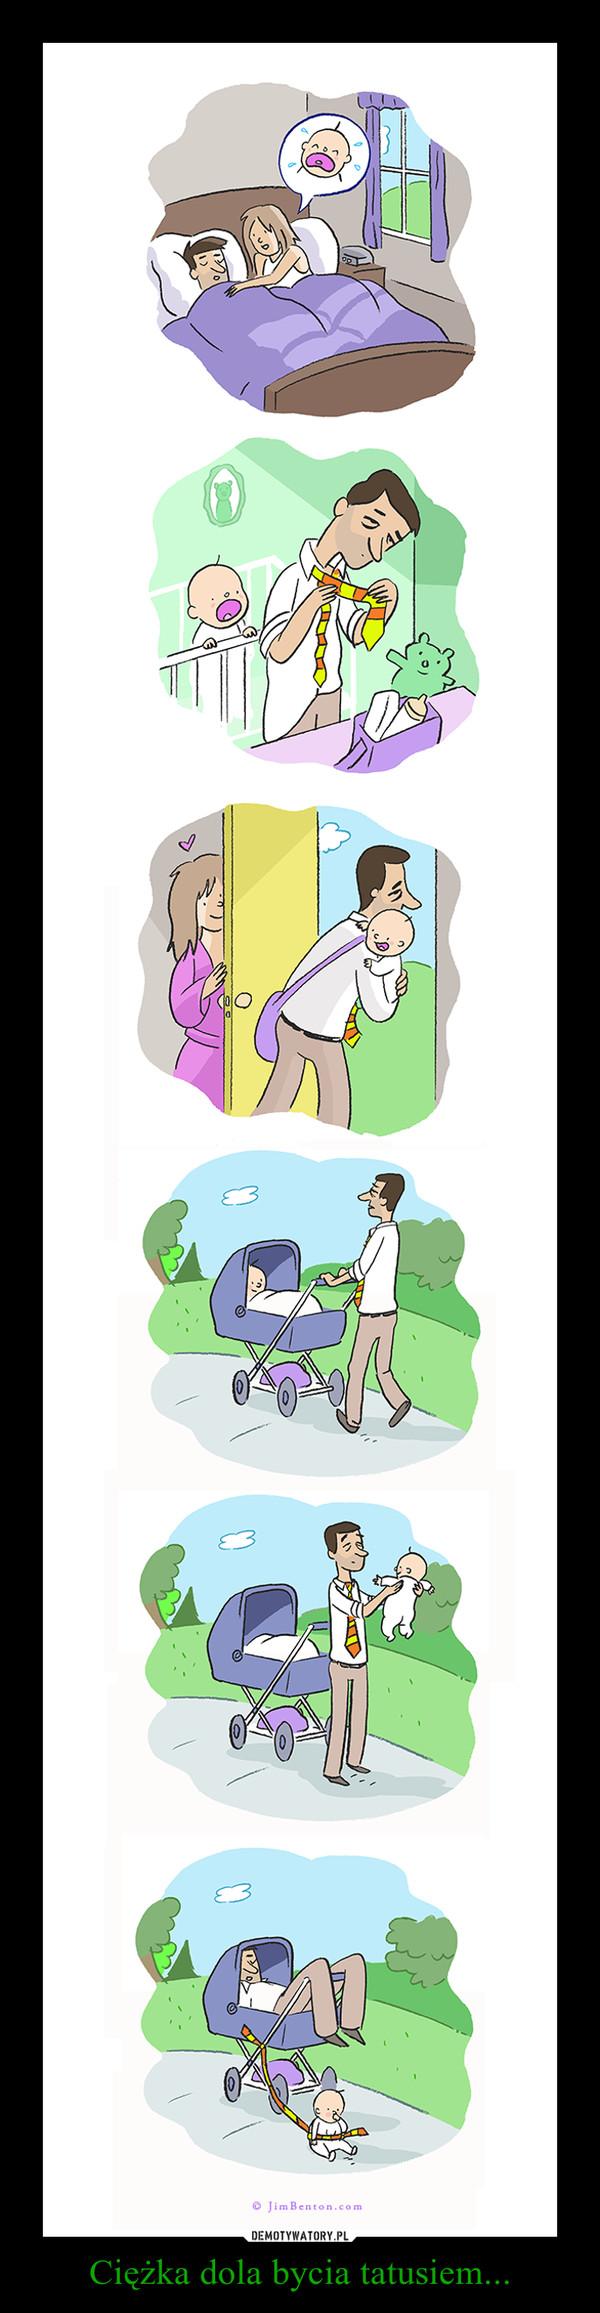 Ciężka dola bycia tatusiem... –